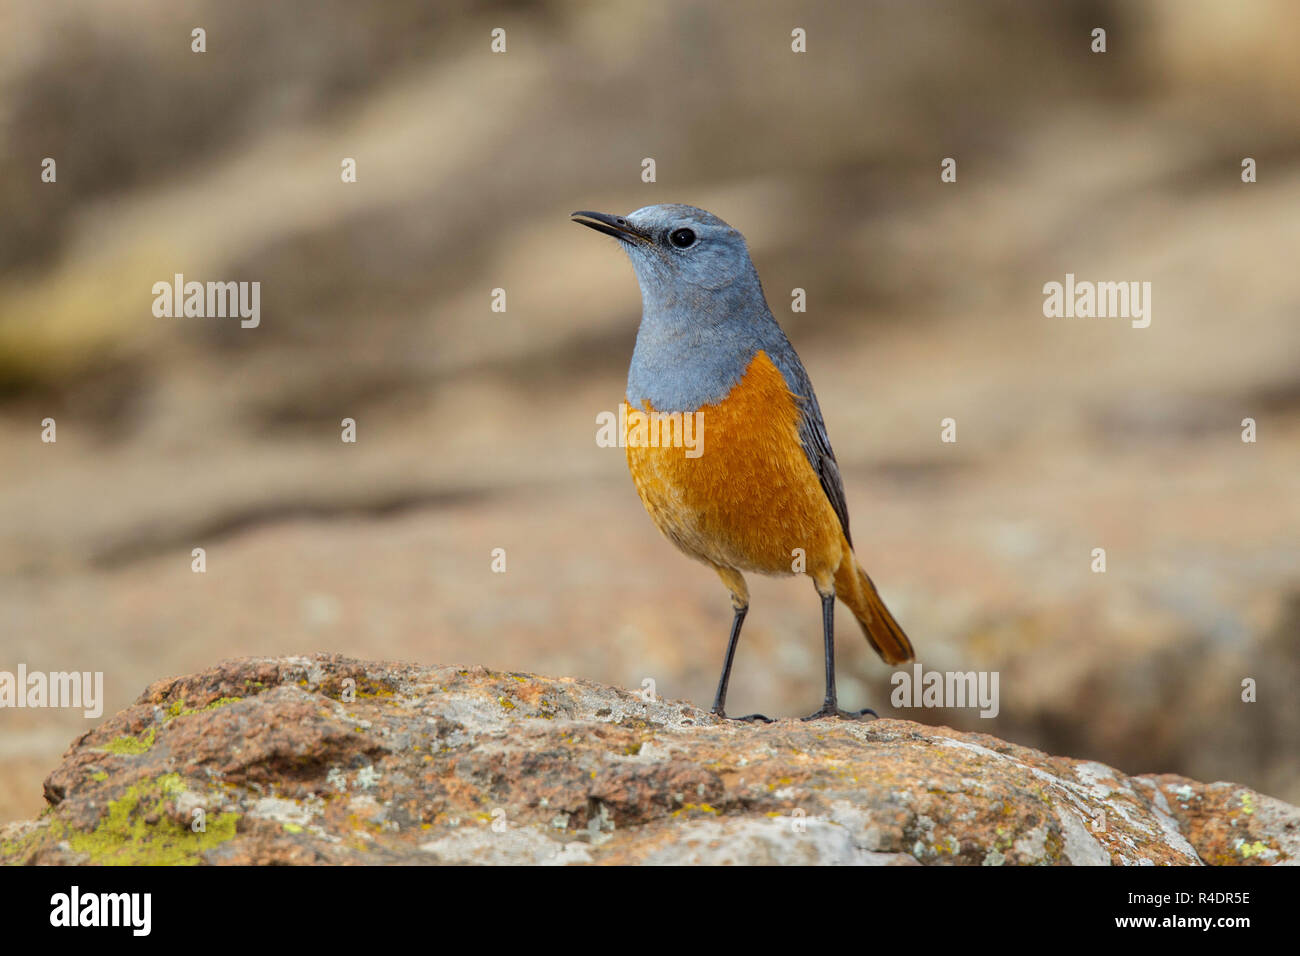 Chat Thrush Stock Photos & Chat Thrush Stock Images - Alamy